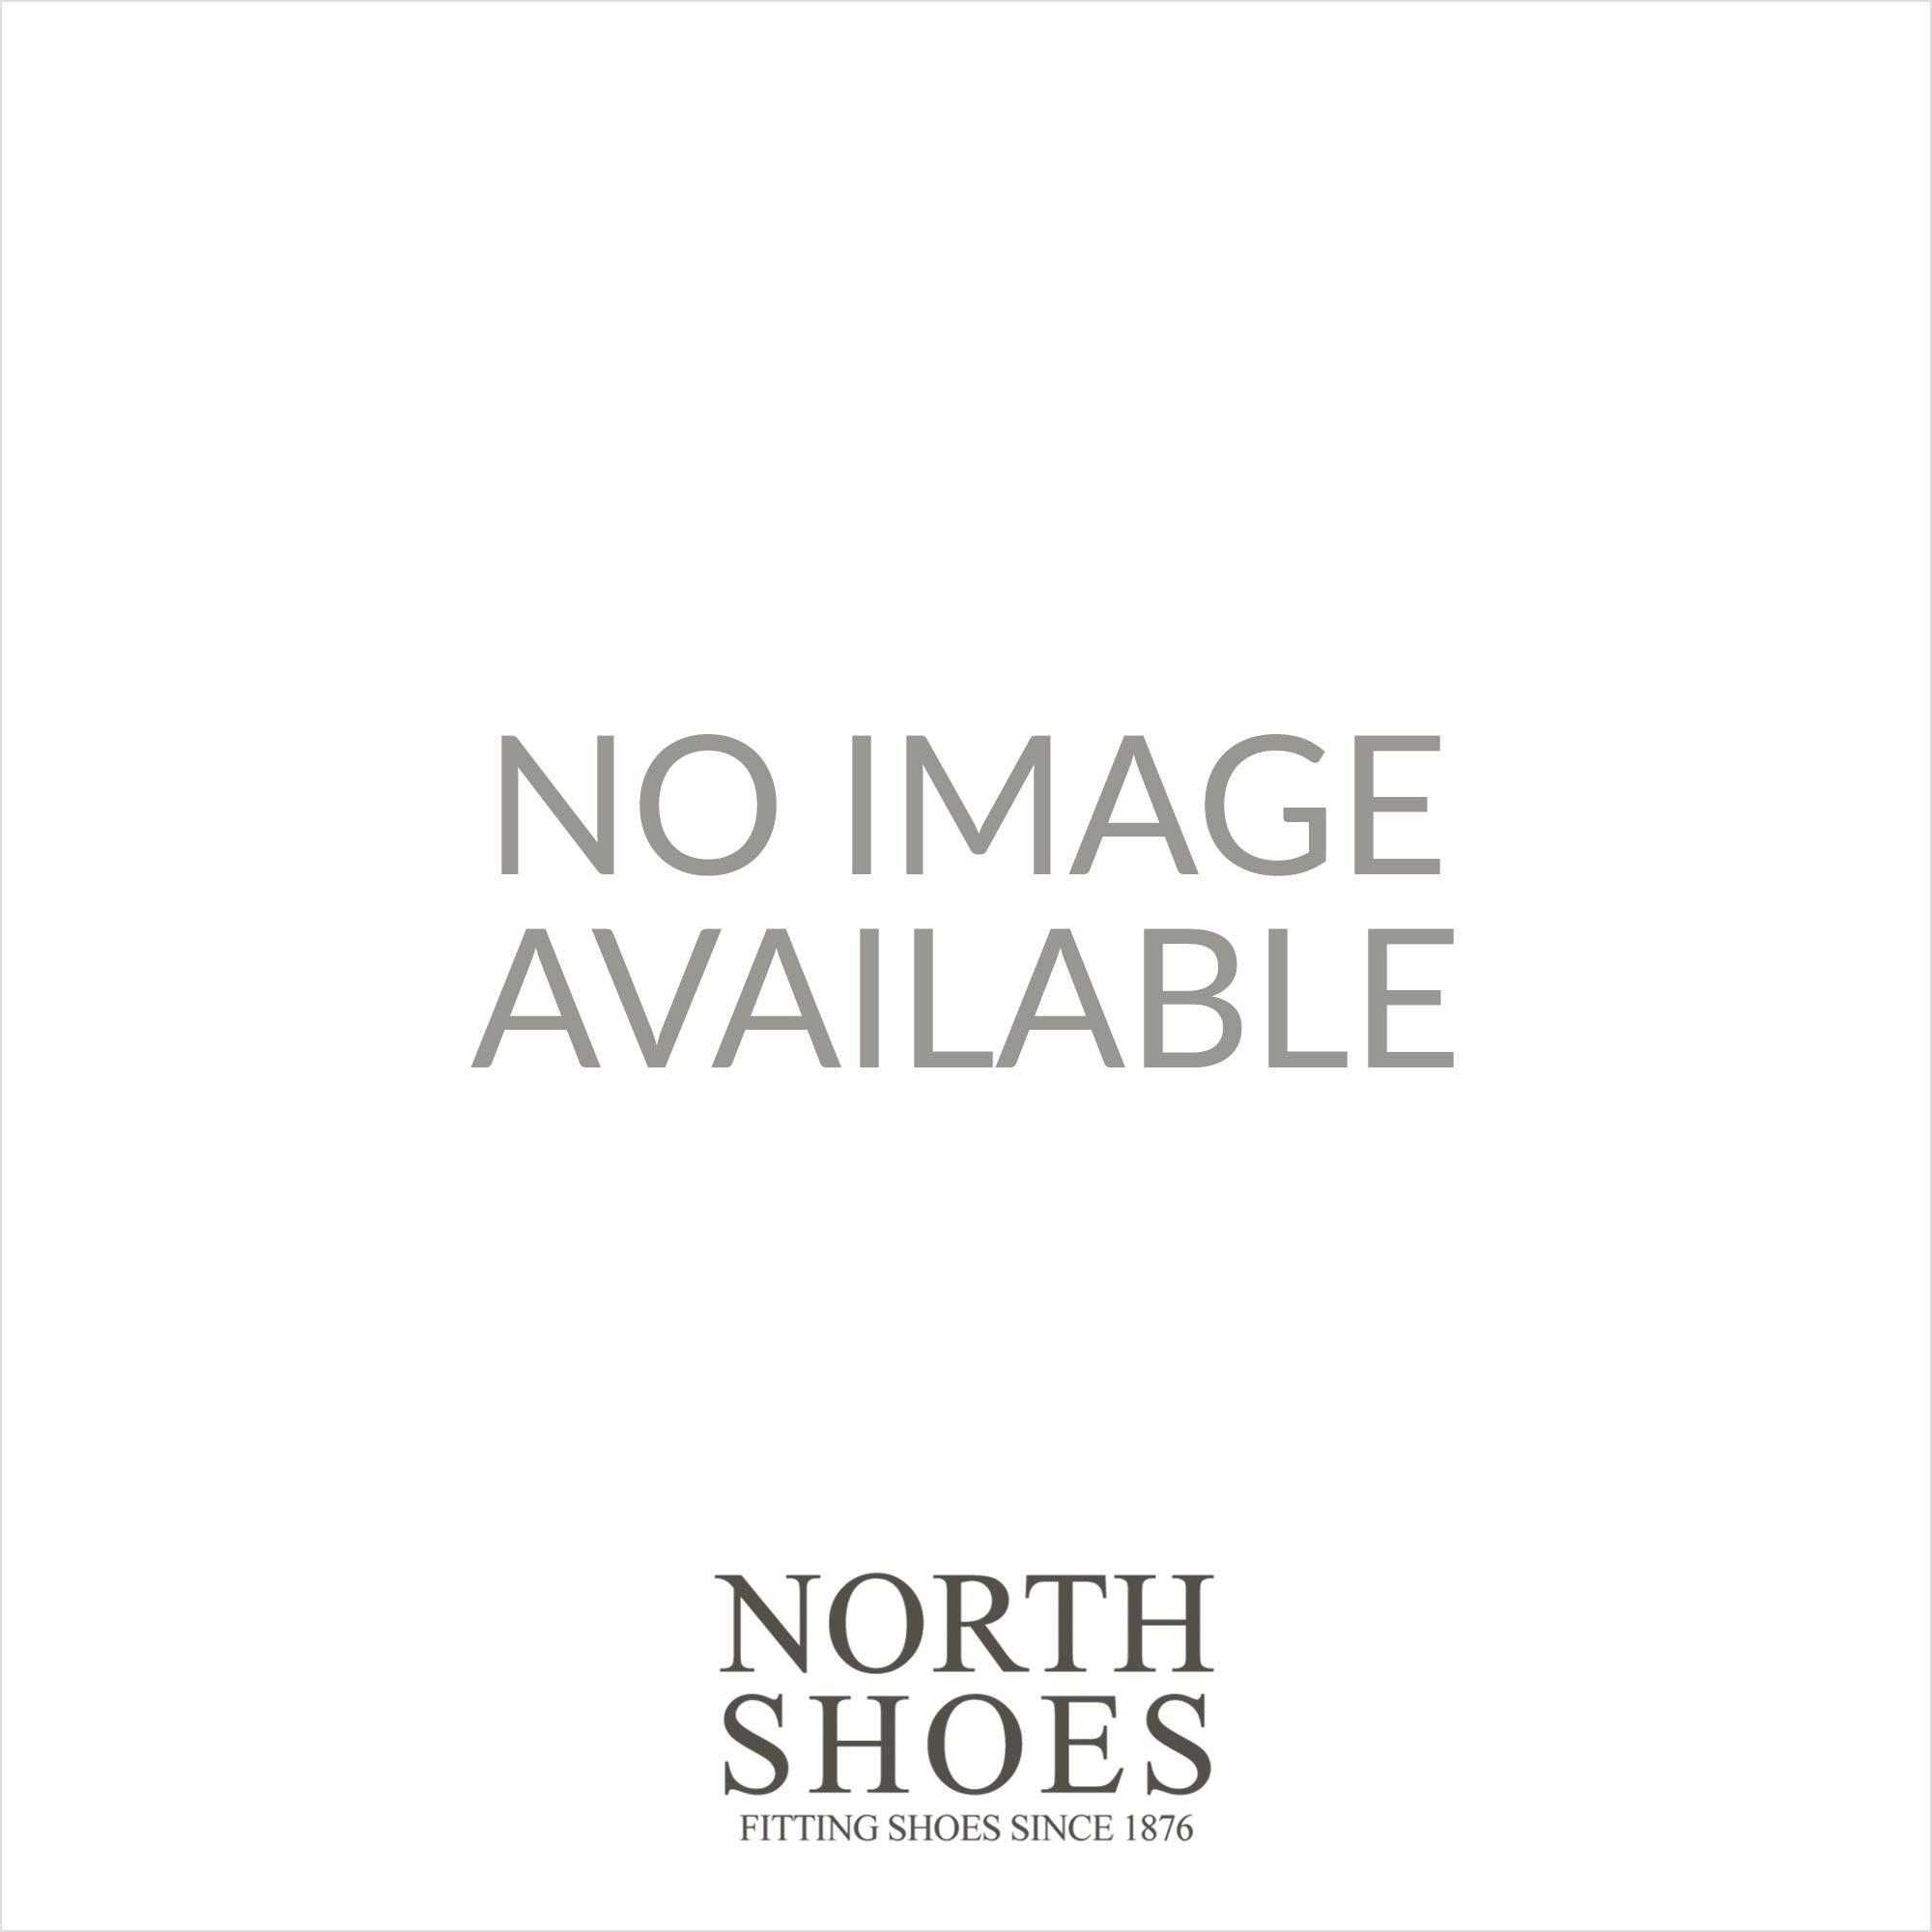 ARA 60006-01 Black Patent Leather Womens Lace Up Brogue Shoe